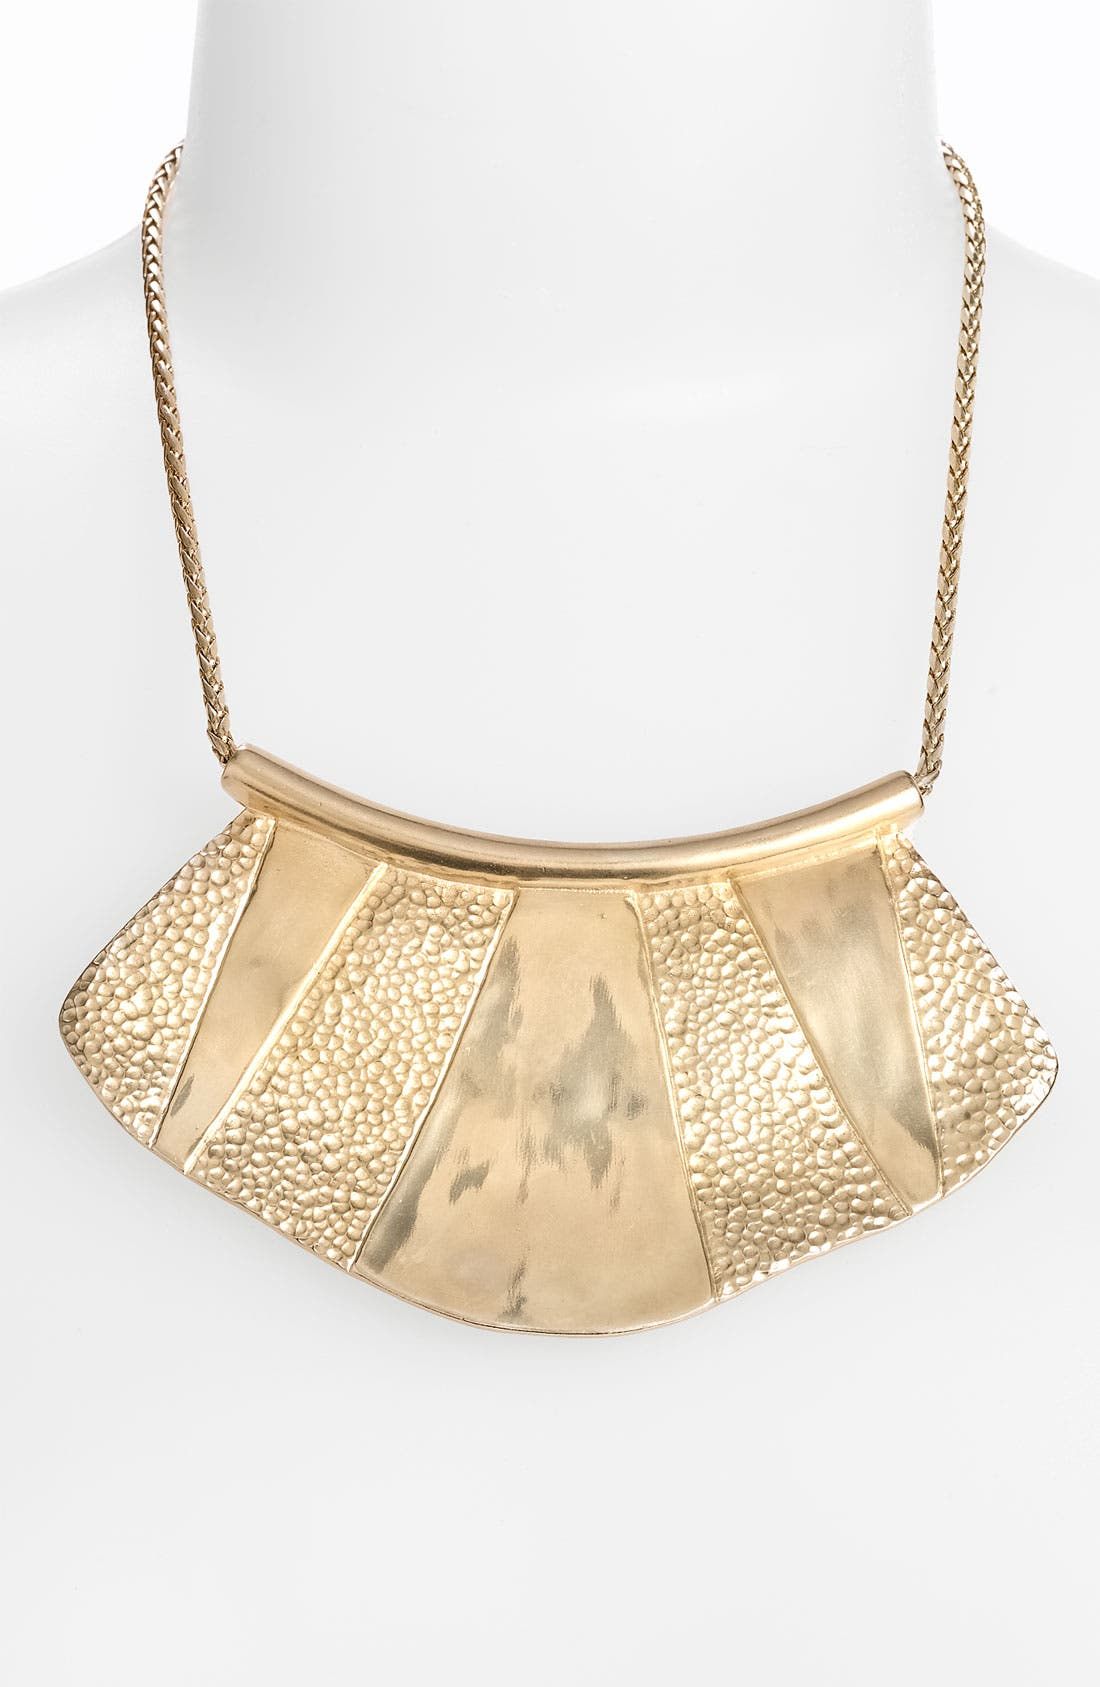 Main Image - Nordstrom 'Tribal Metal' Bib Necklace